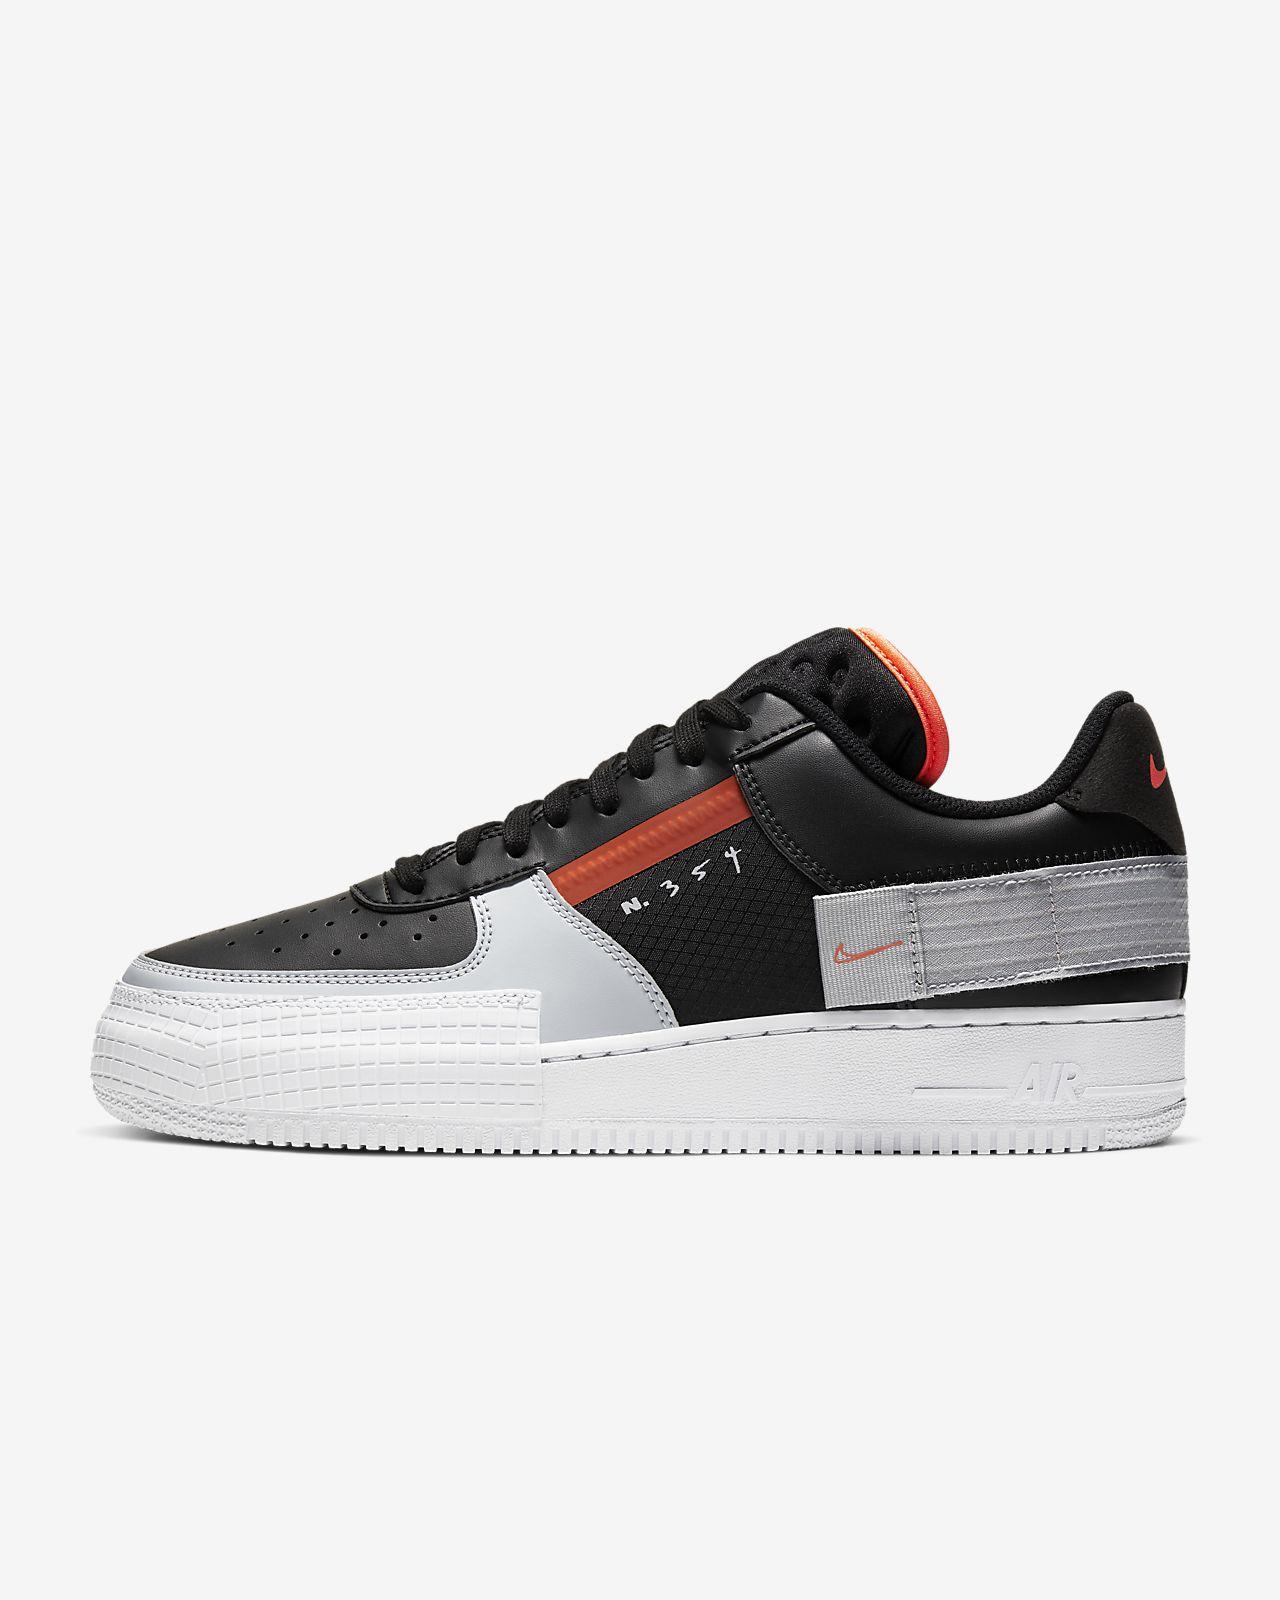 Nike Air Force 1 Type Herrenschuh